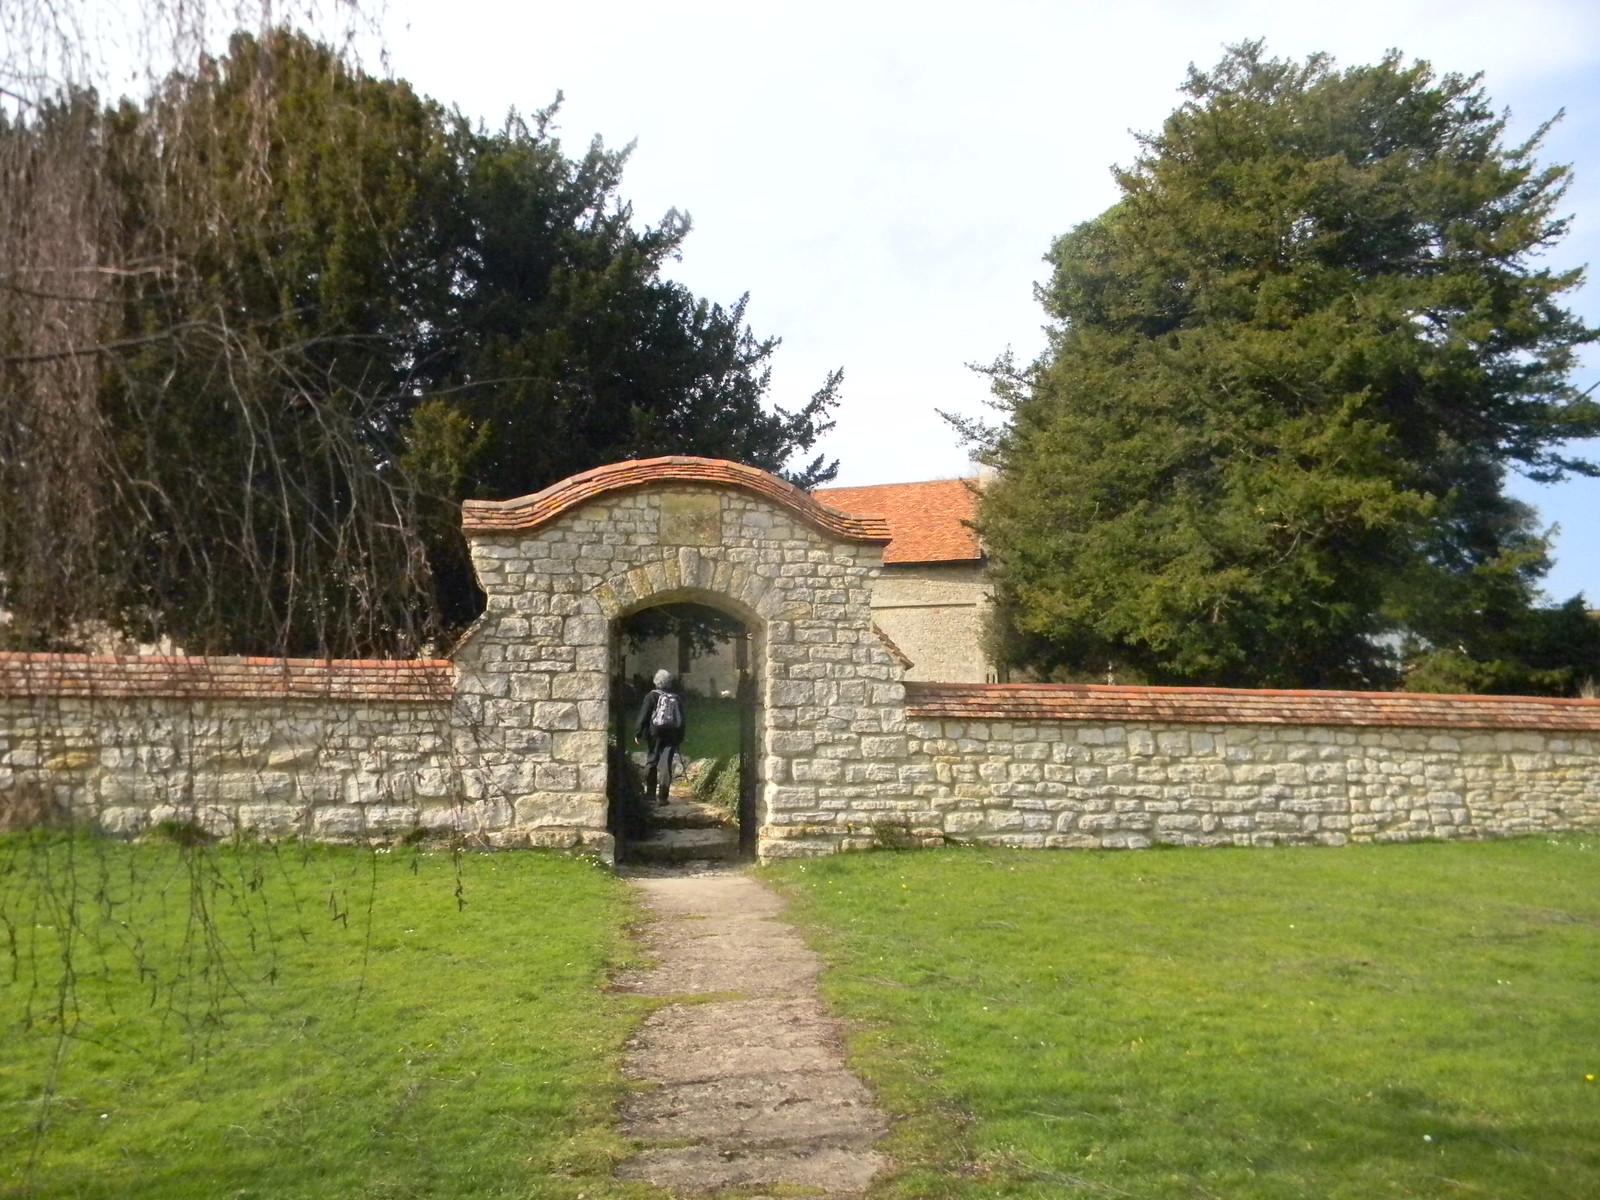 Dinton churchyard Haddenham to Aylesbury